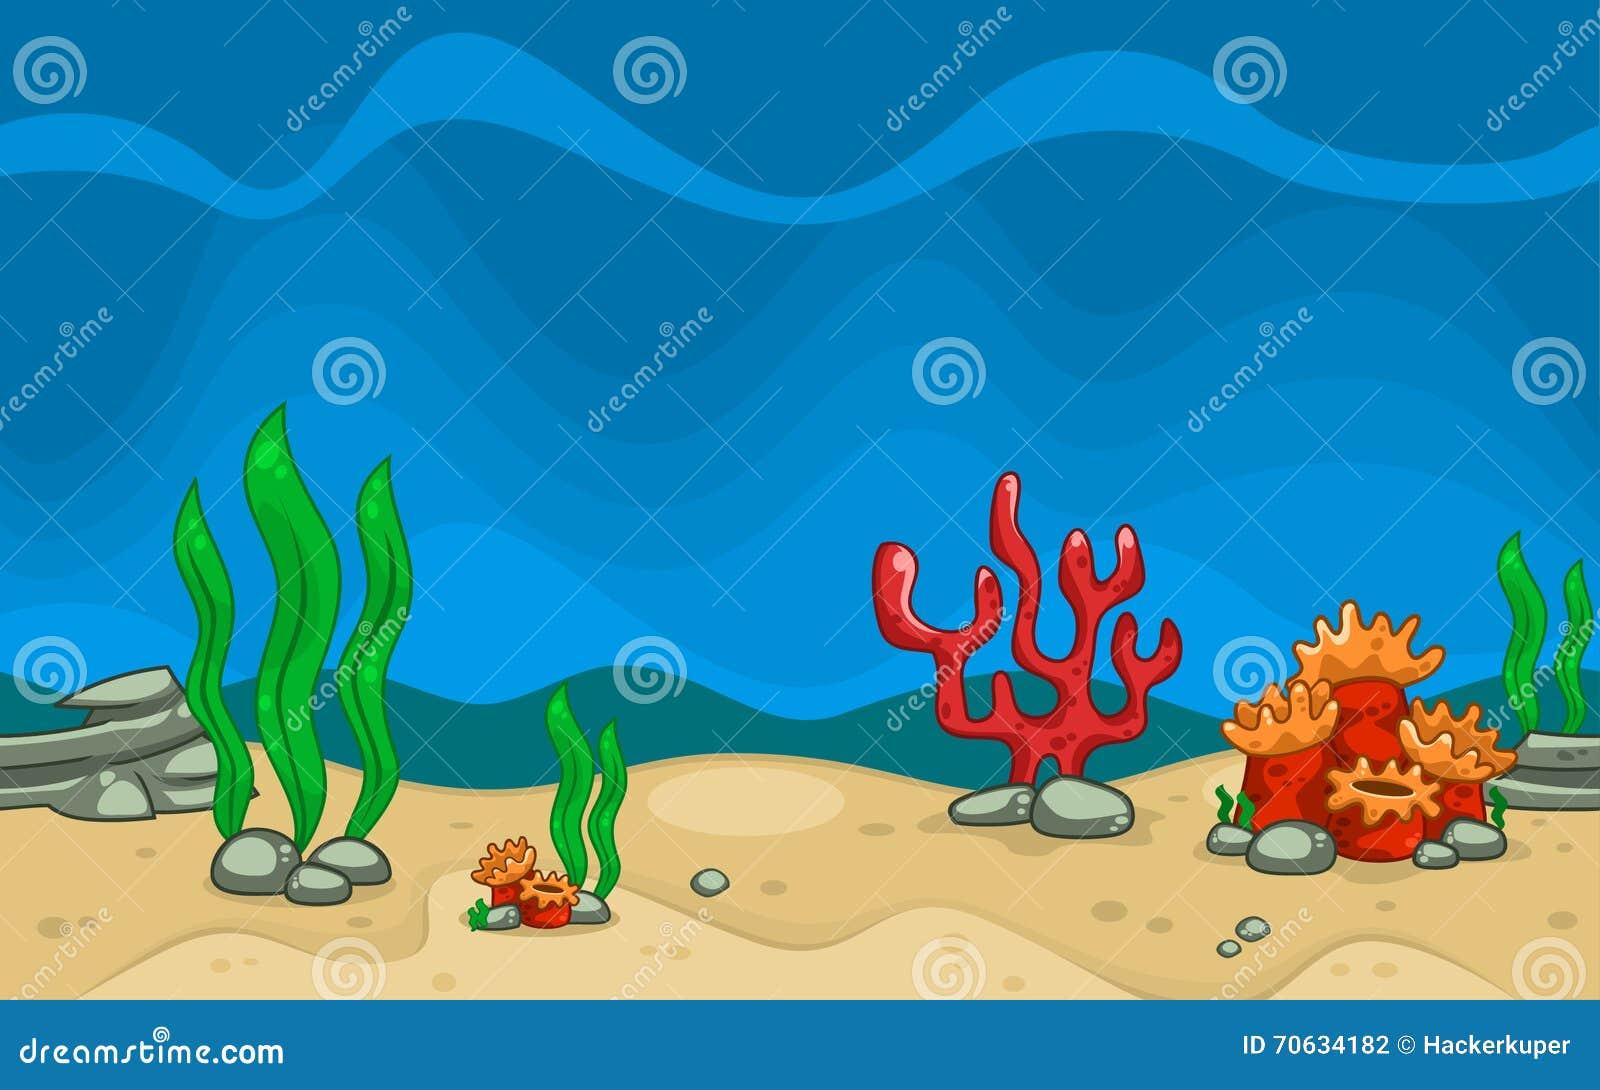 Vector Cartoon Sea Creature And Plant In Blue Underwater